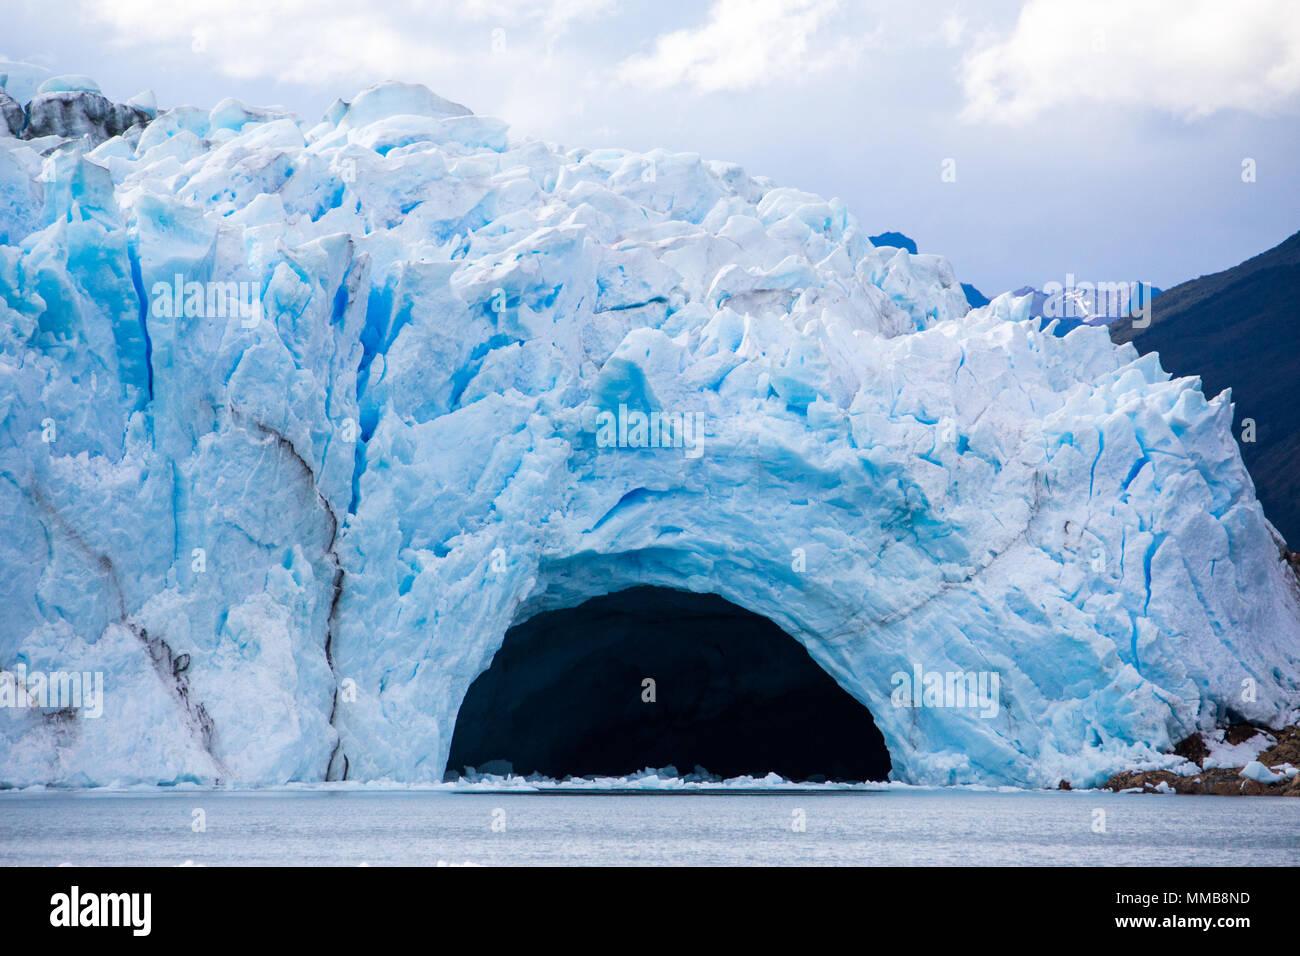 Perito Moreno glacier ice bridge, Patagonia, Argentina - Stock Image